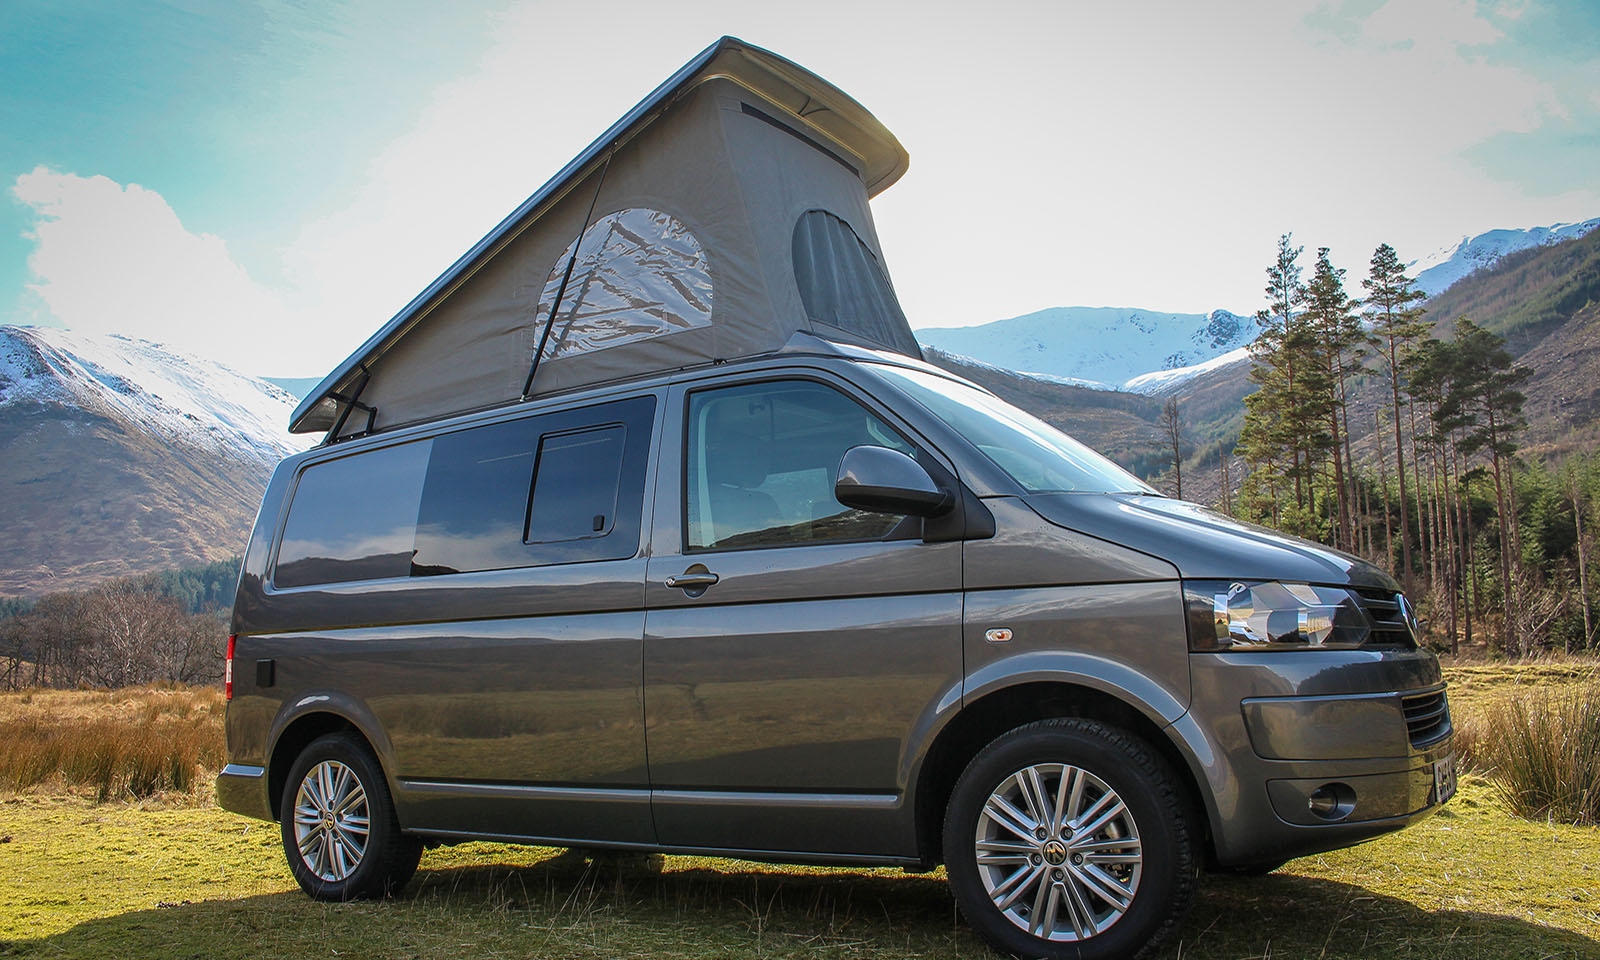 VW T5 Highline Campervan Conversion with SCA 190 Comfort front elevating pop top roof